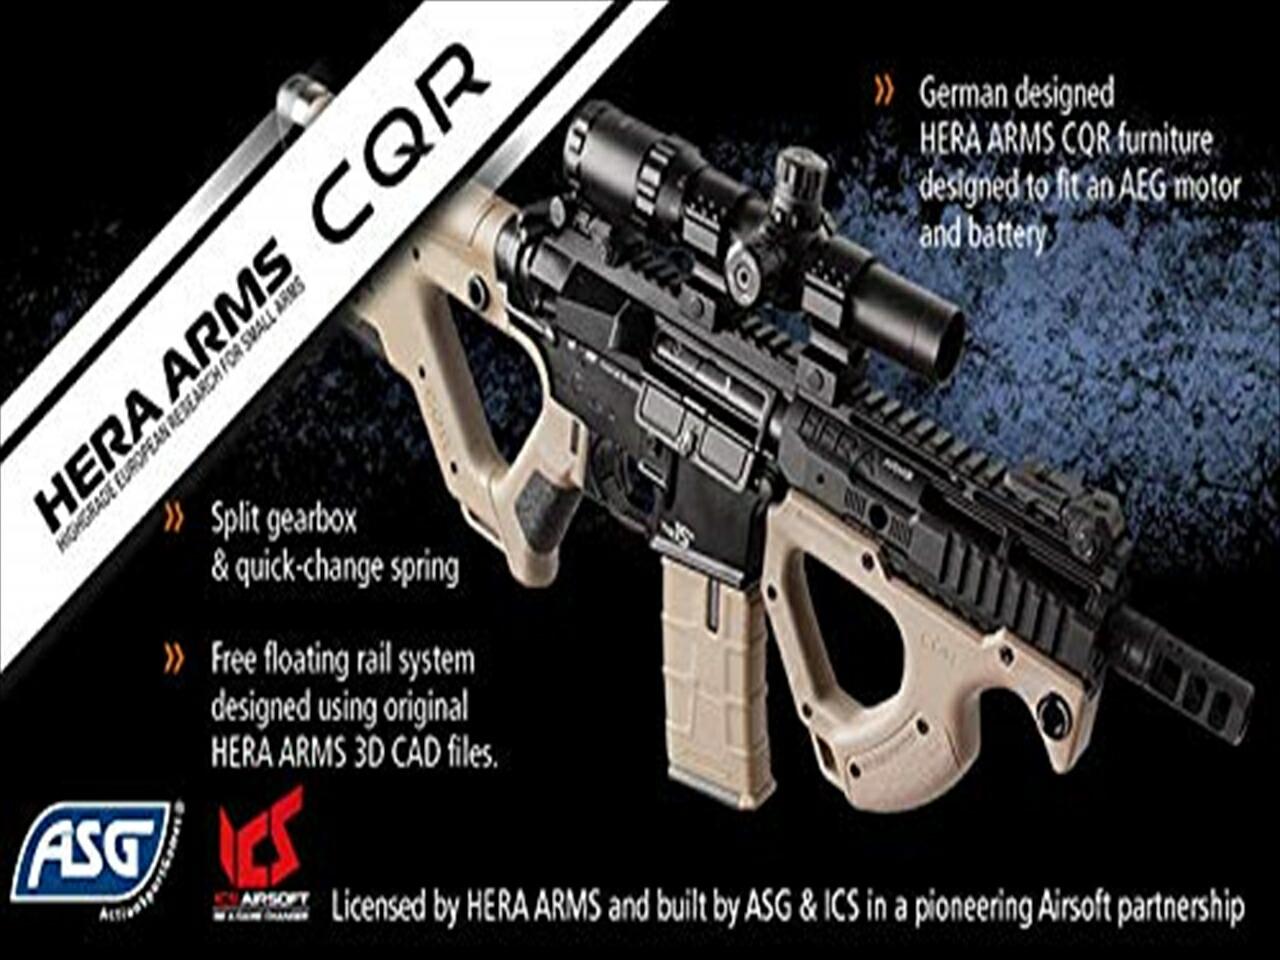 HERA ARMS CQR 電動ガン ICS AIRSOFT ASG SSS サバゲー ライセンス品 6mmBB エアガン 18歳以上 新品